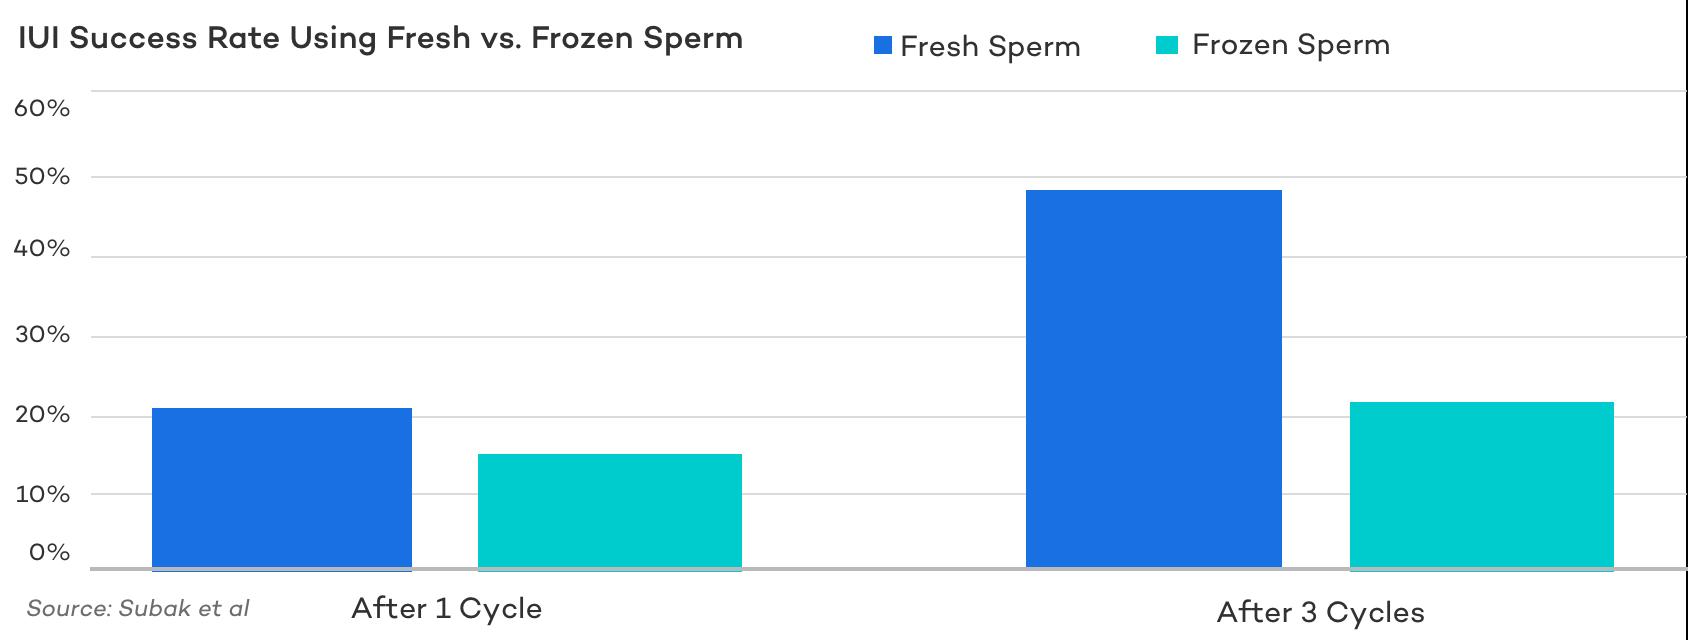 IUI Success Rate Using Fresh vs. Frozen Sperm